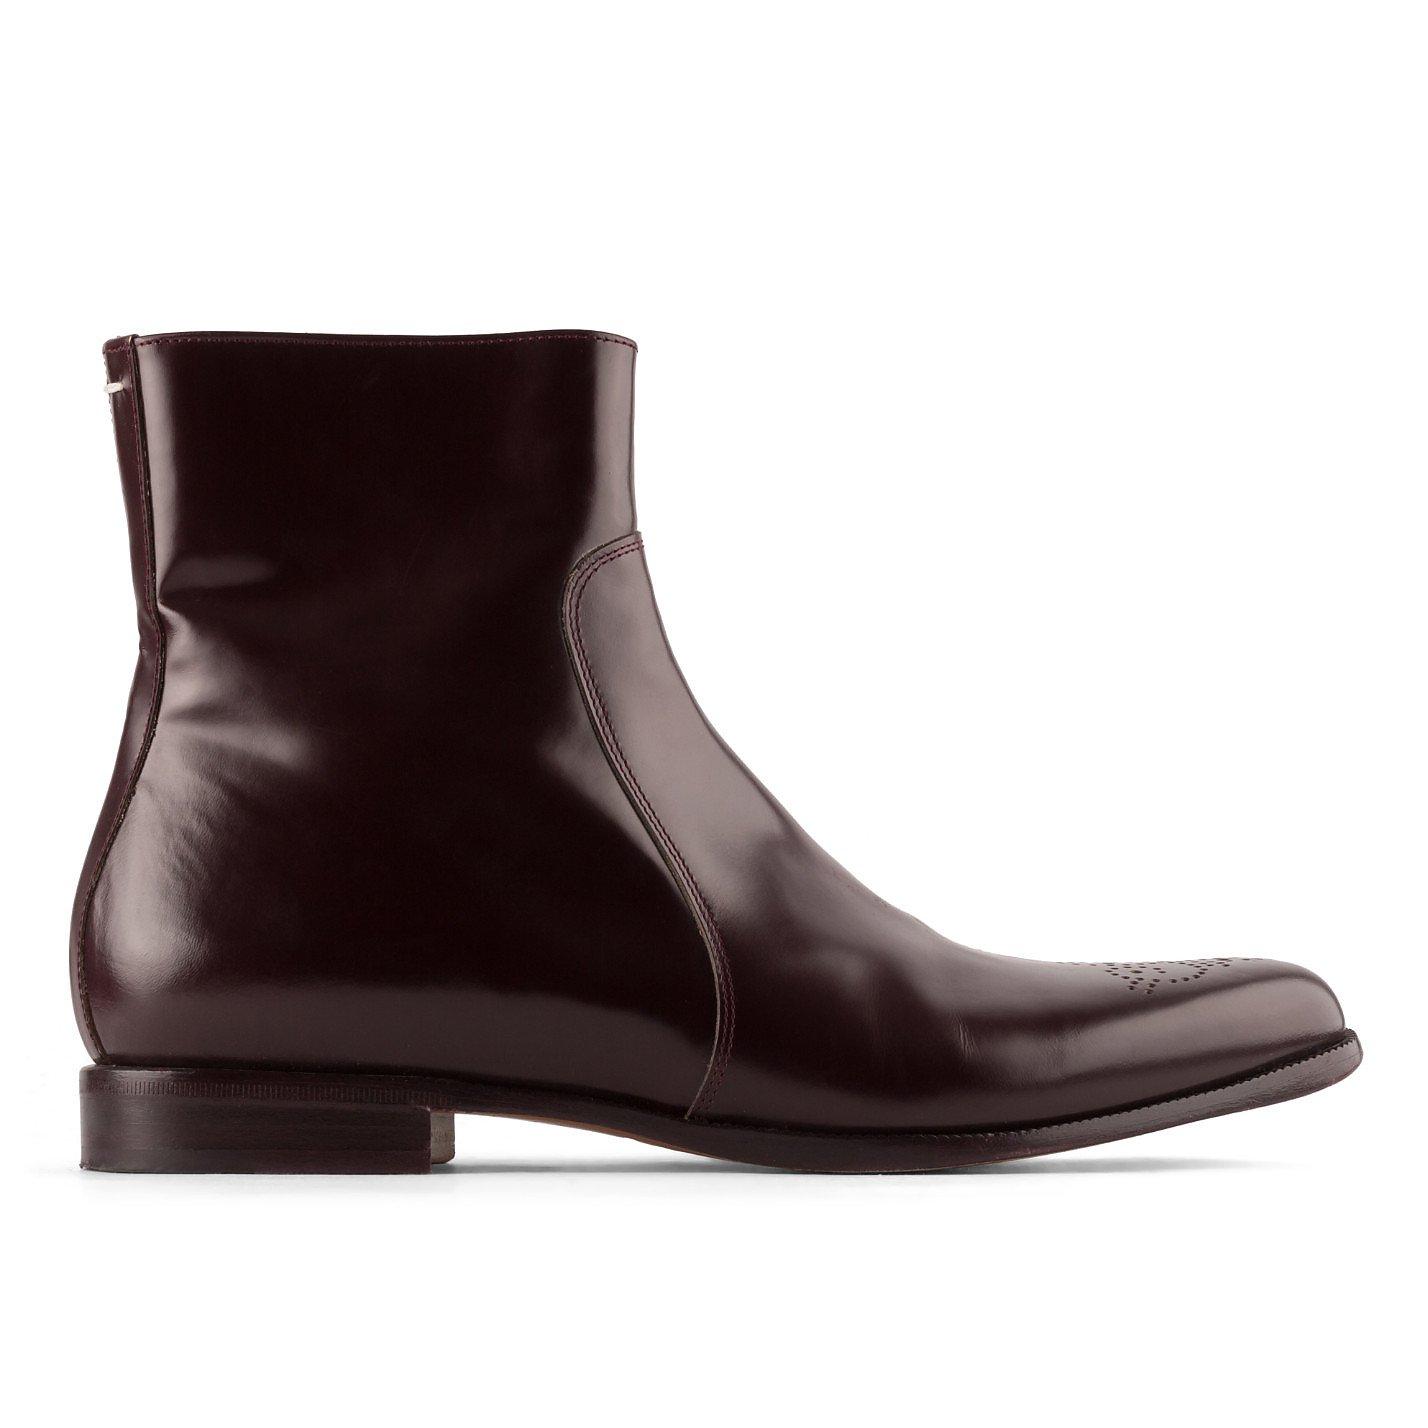 Maison Martin Margiela Patent Ankle Boots